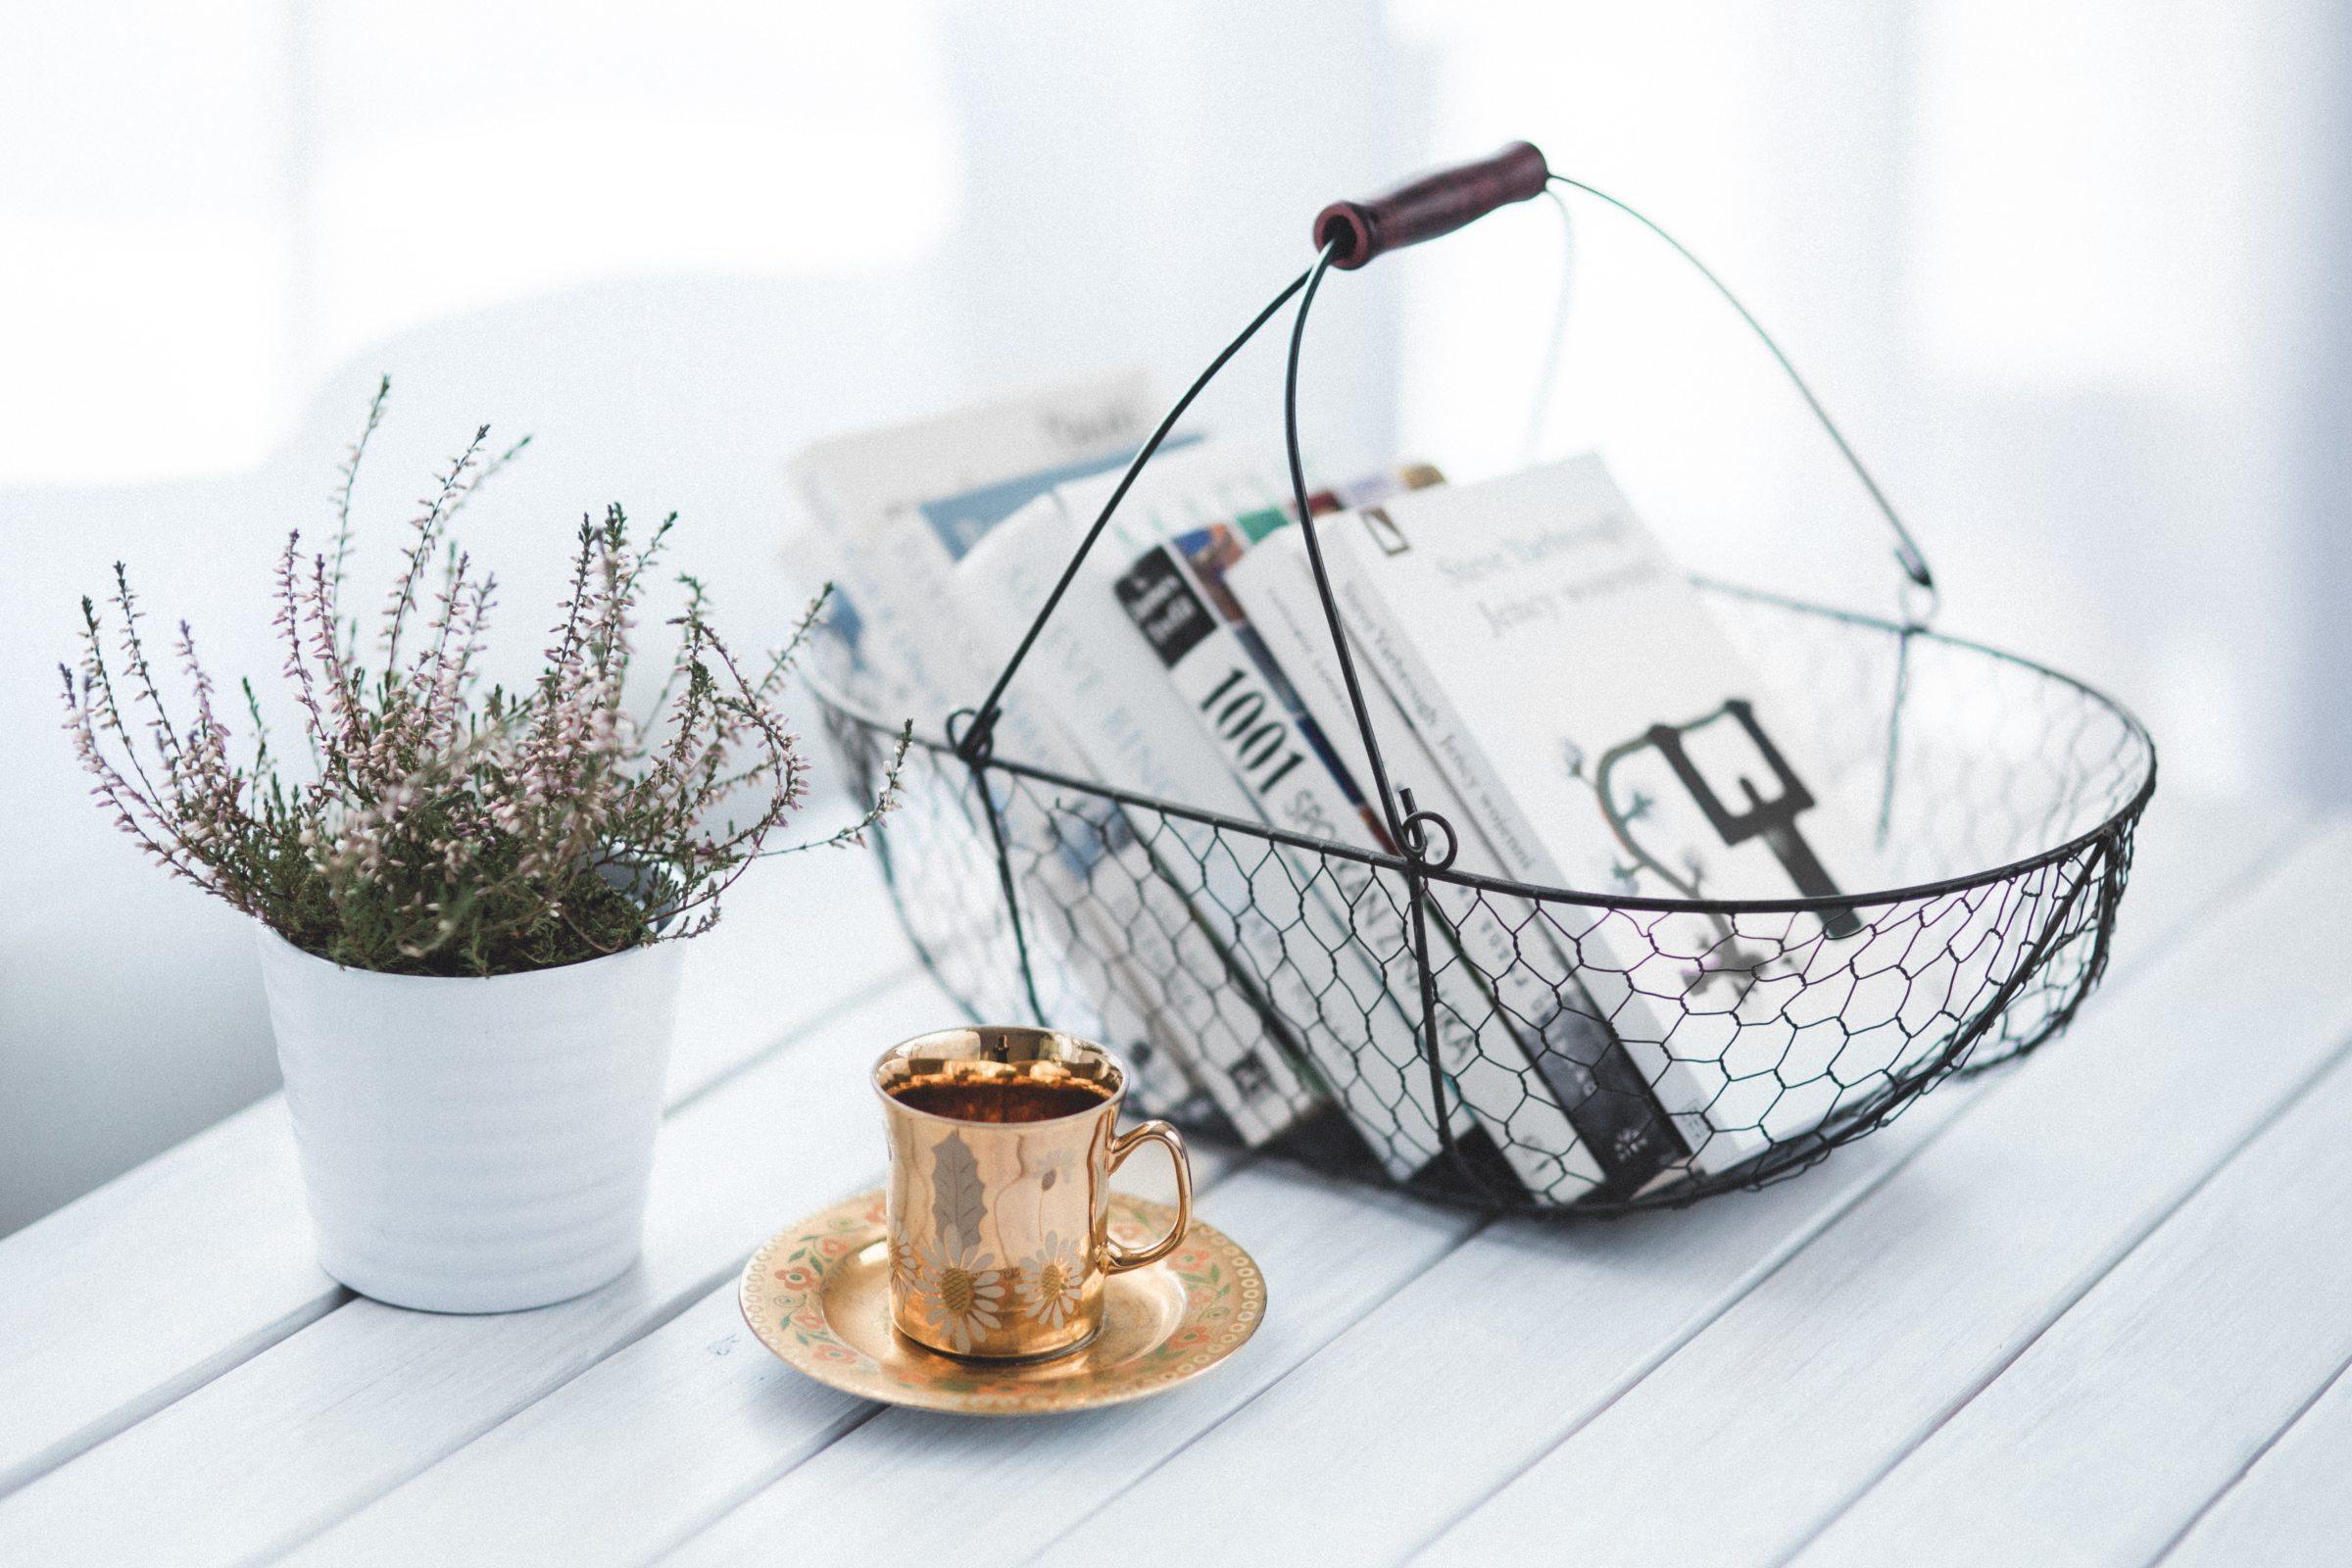 basket-book-books-63321